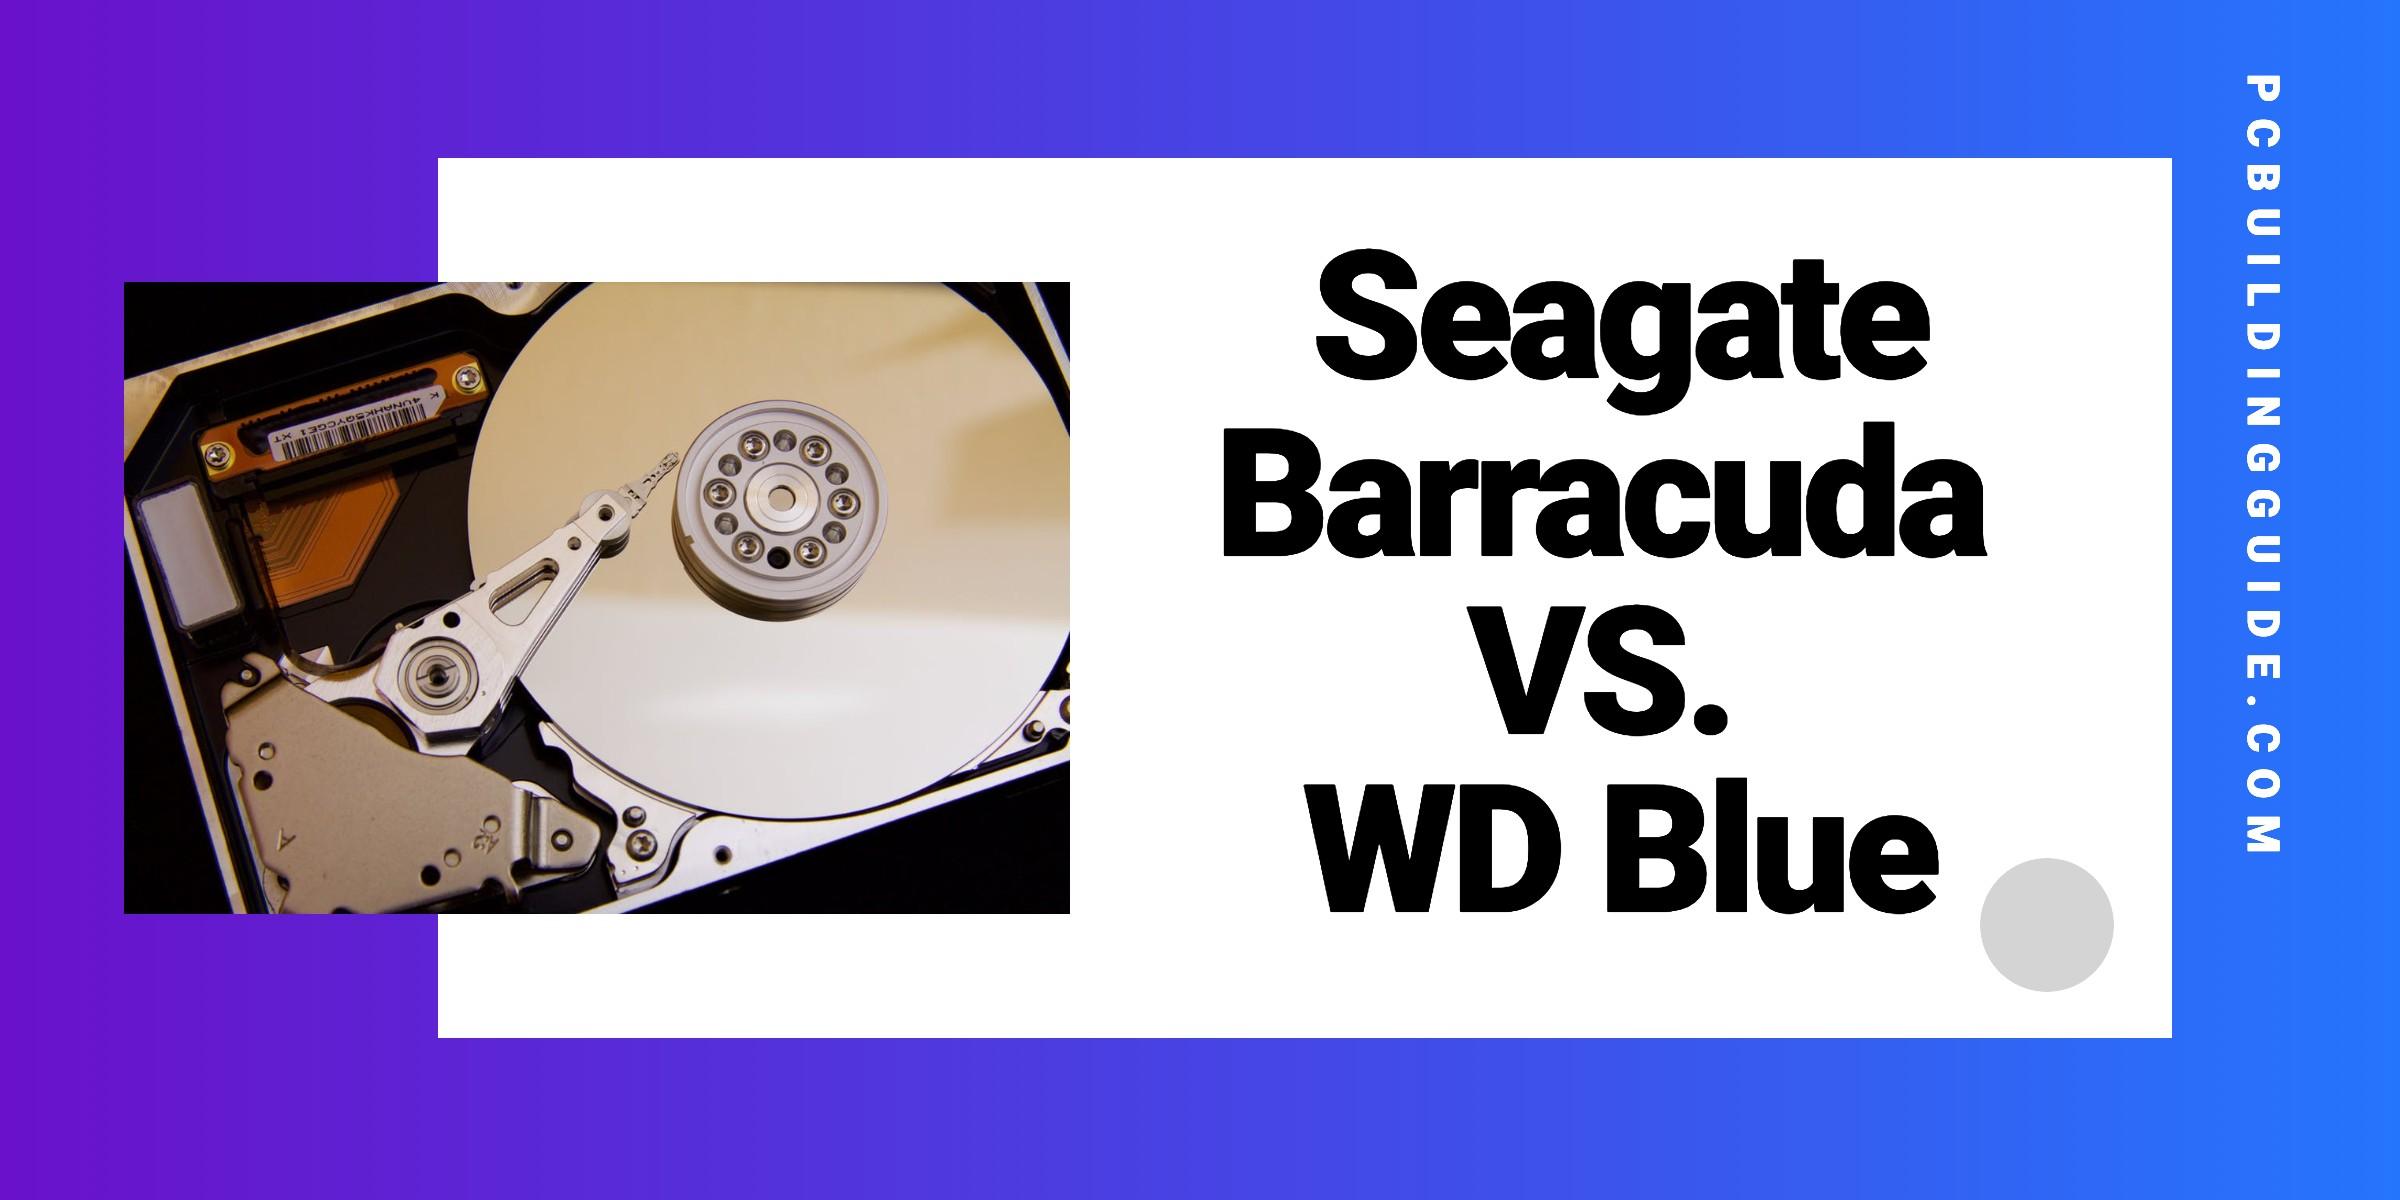 Seagate barracuda vs wd blue